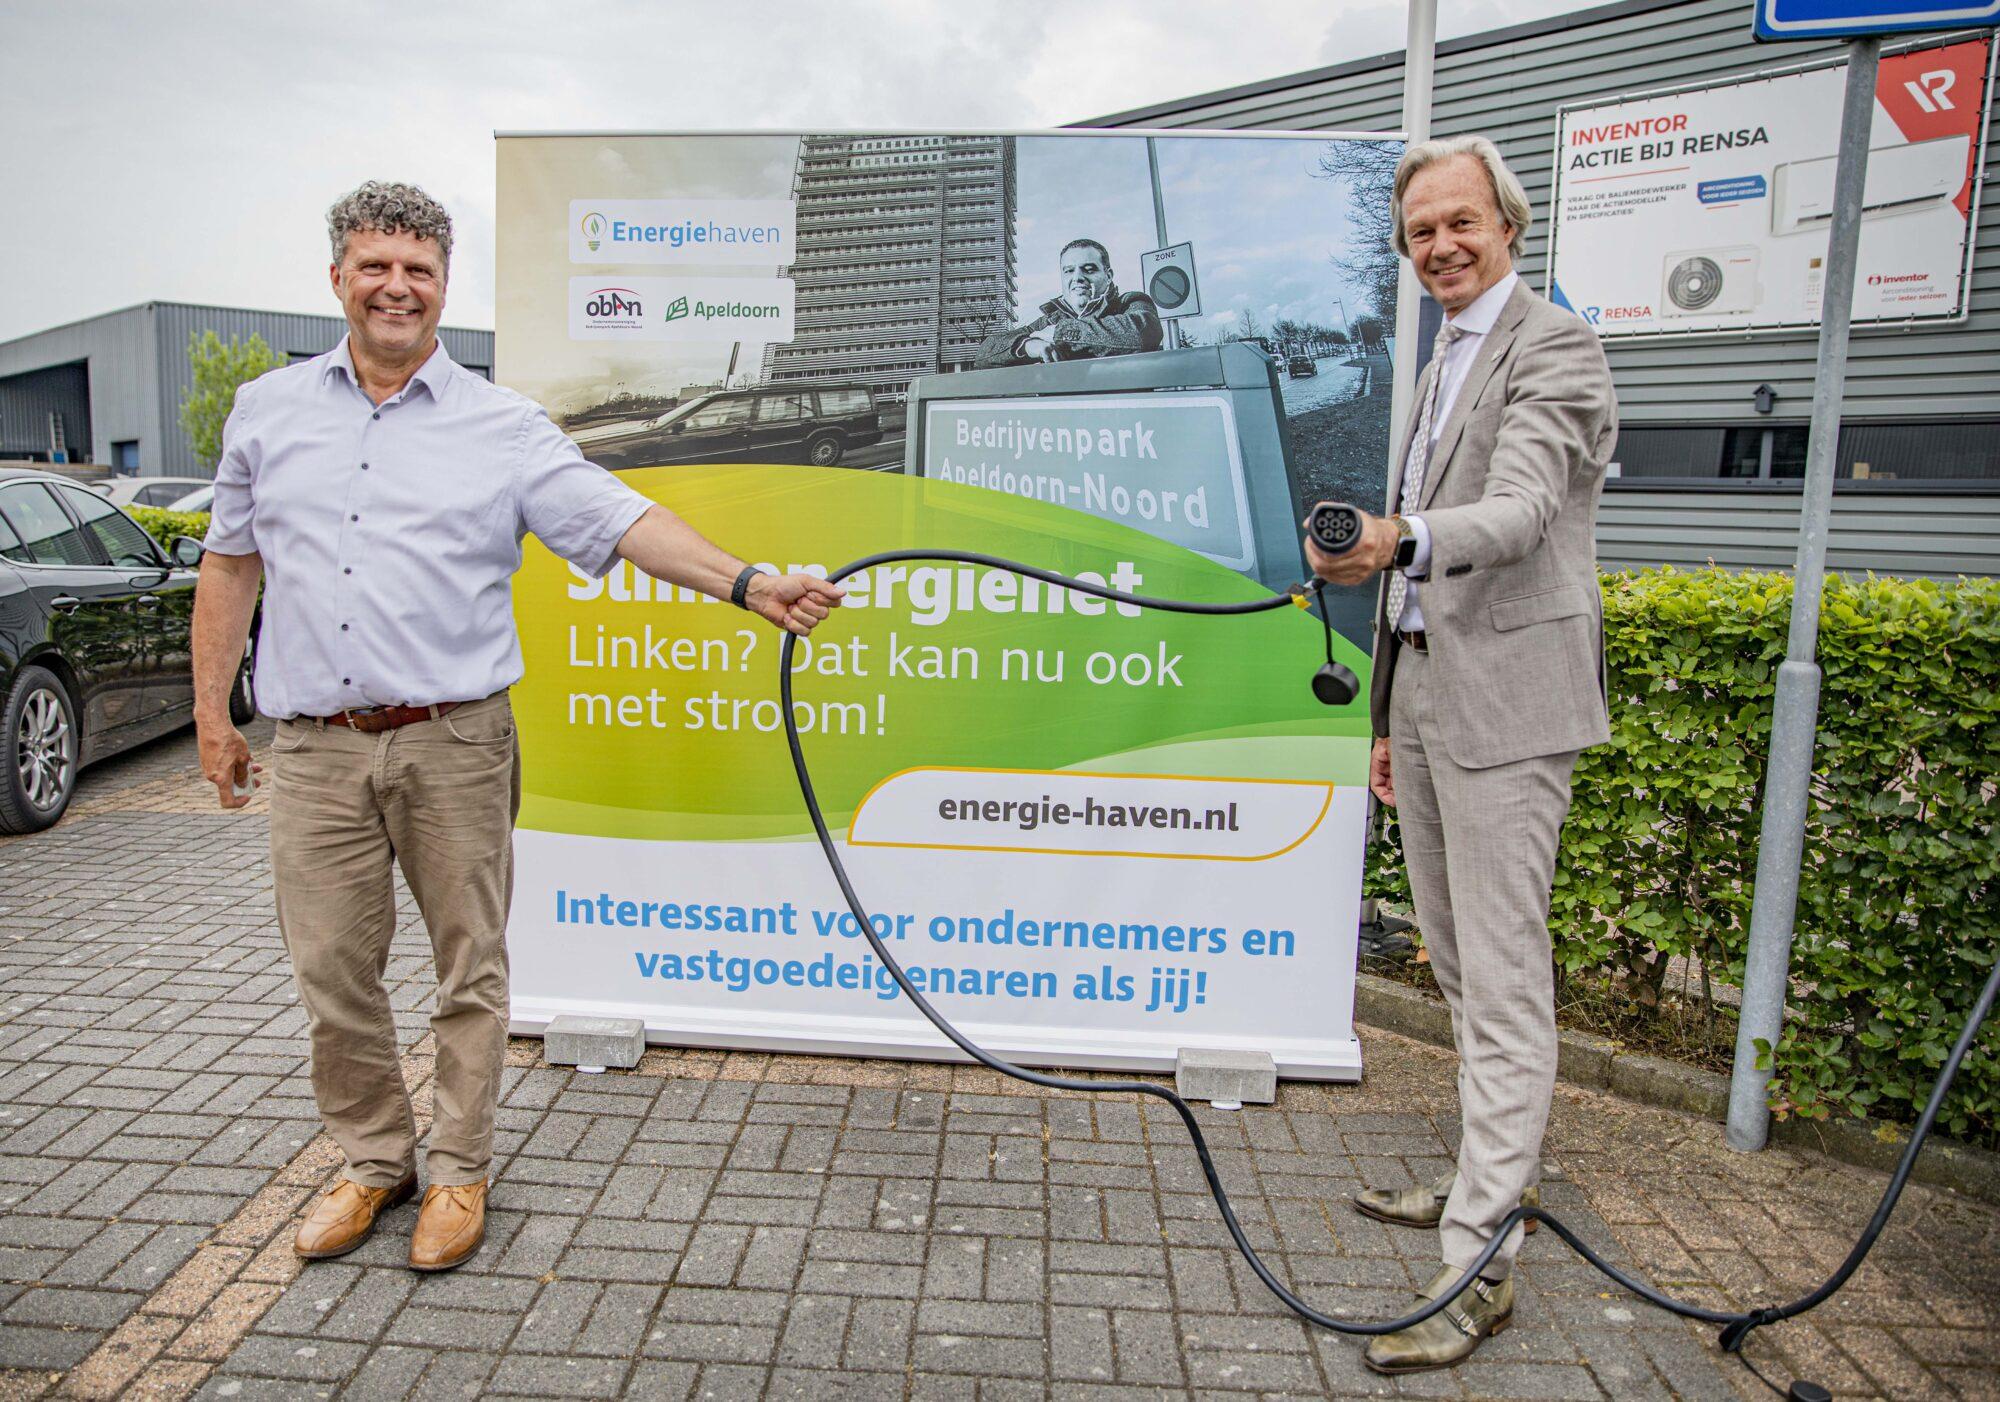 Slim energienet op bedrijvenpark Apeldoorn-Noord geopend